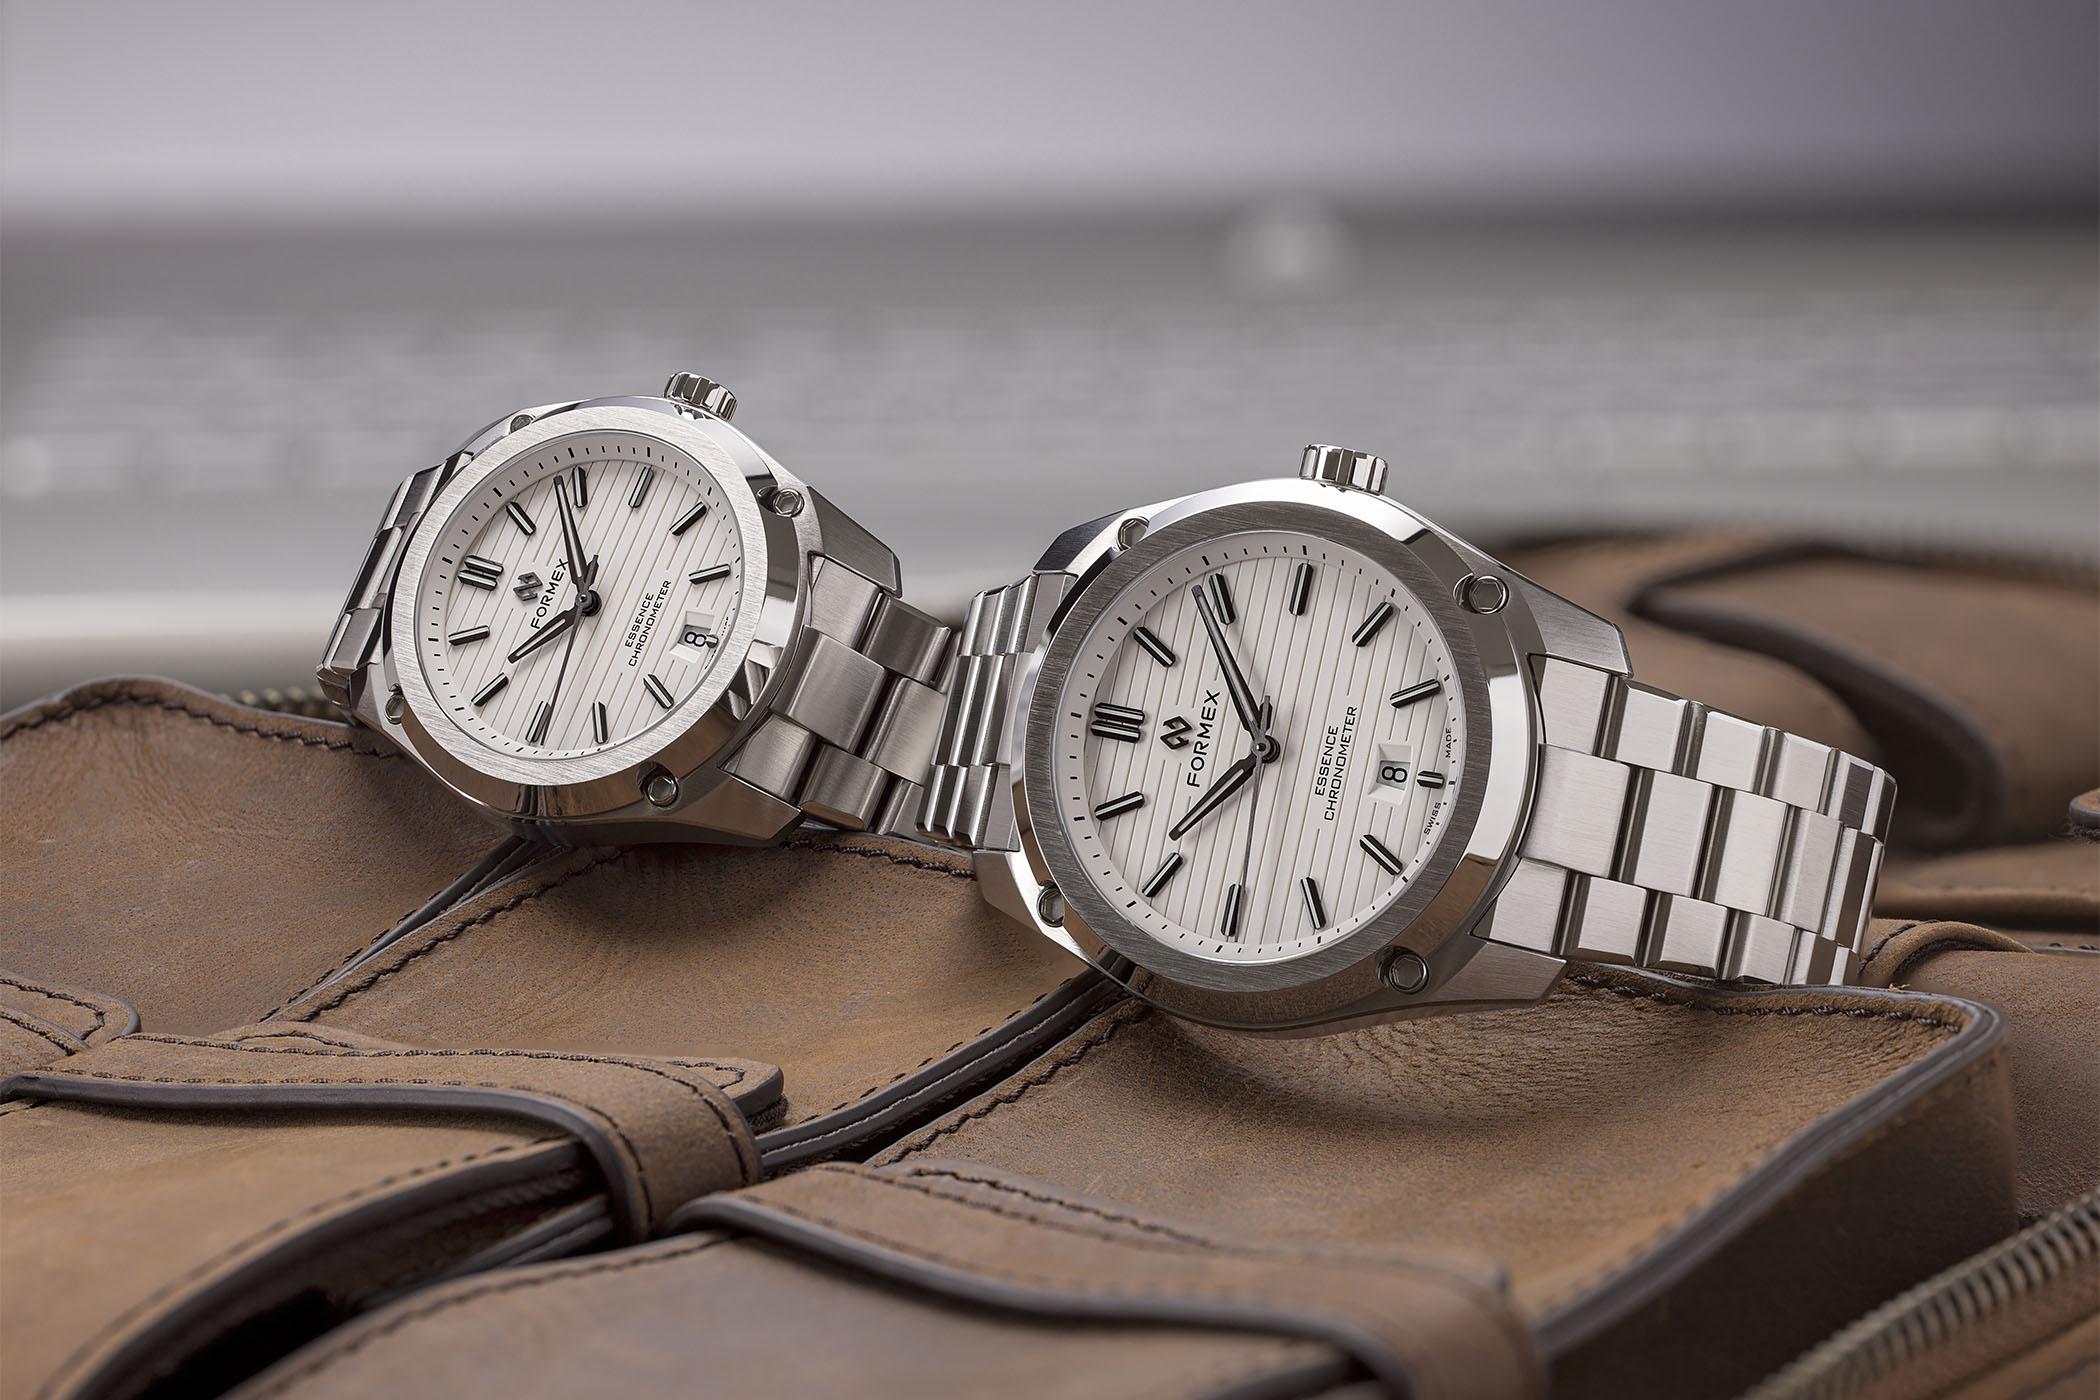 Formex Essence FortyThree Automatic Chronometer and ThirtyNine Automatic Chronometer white dials